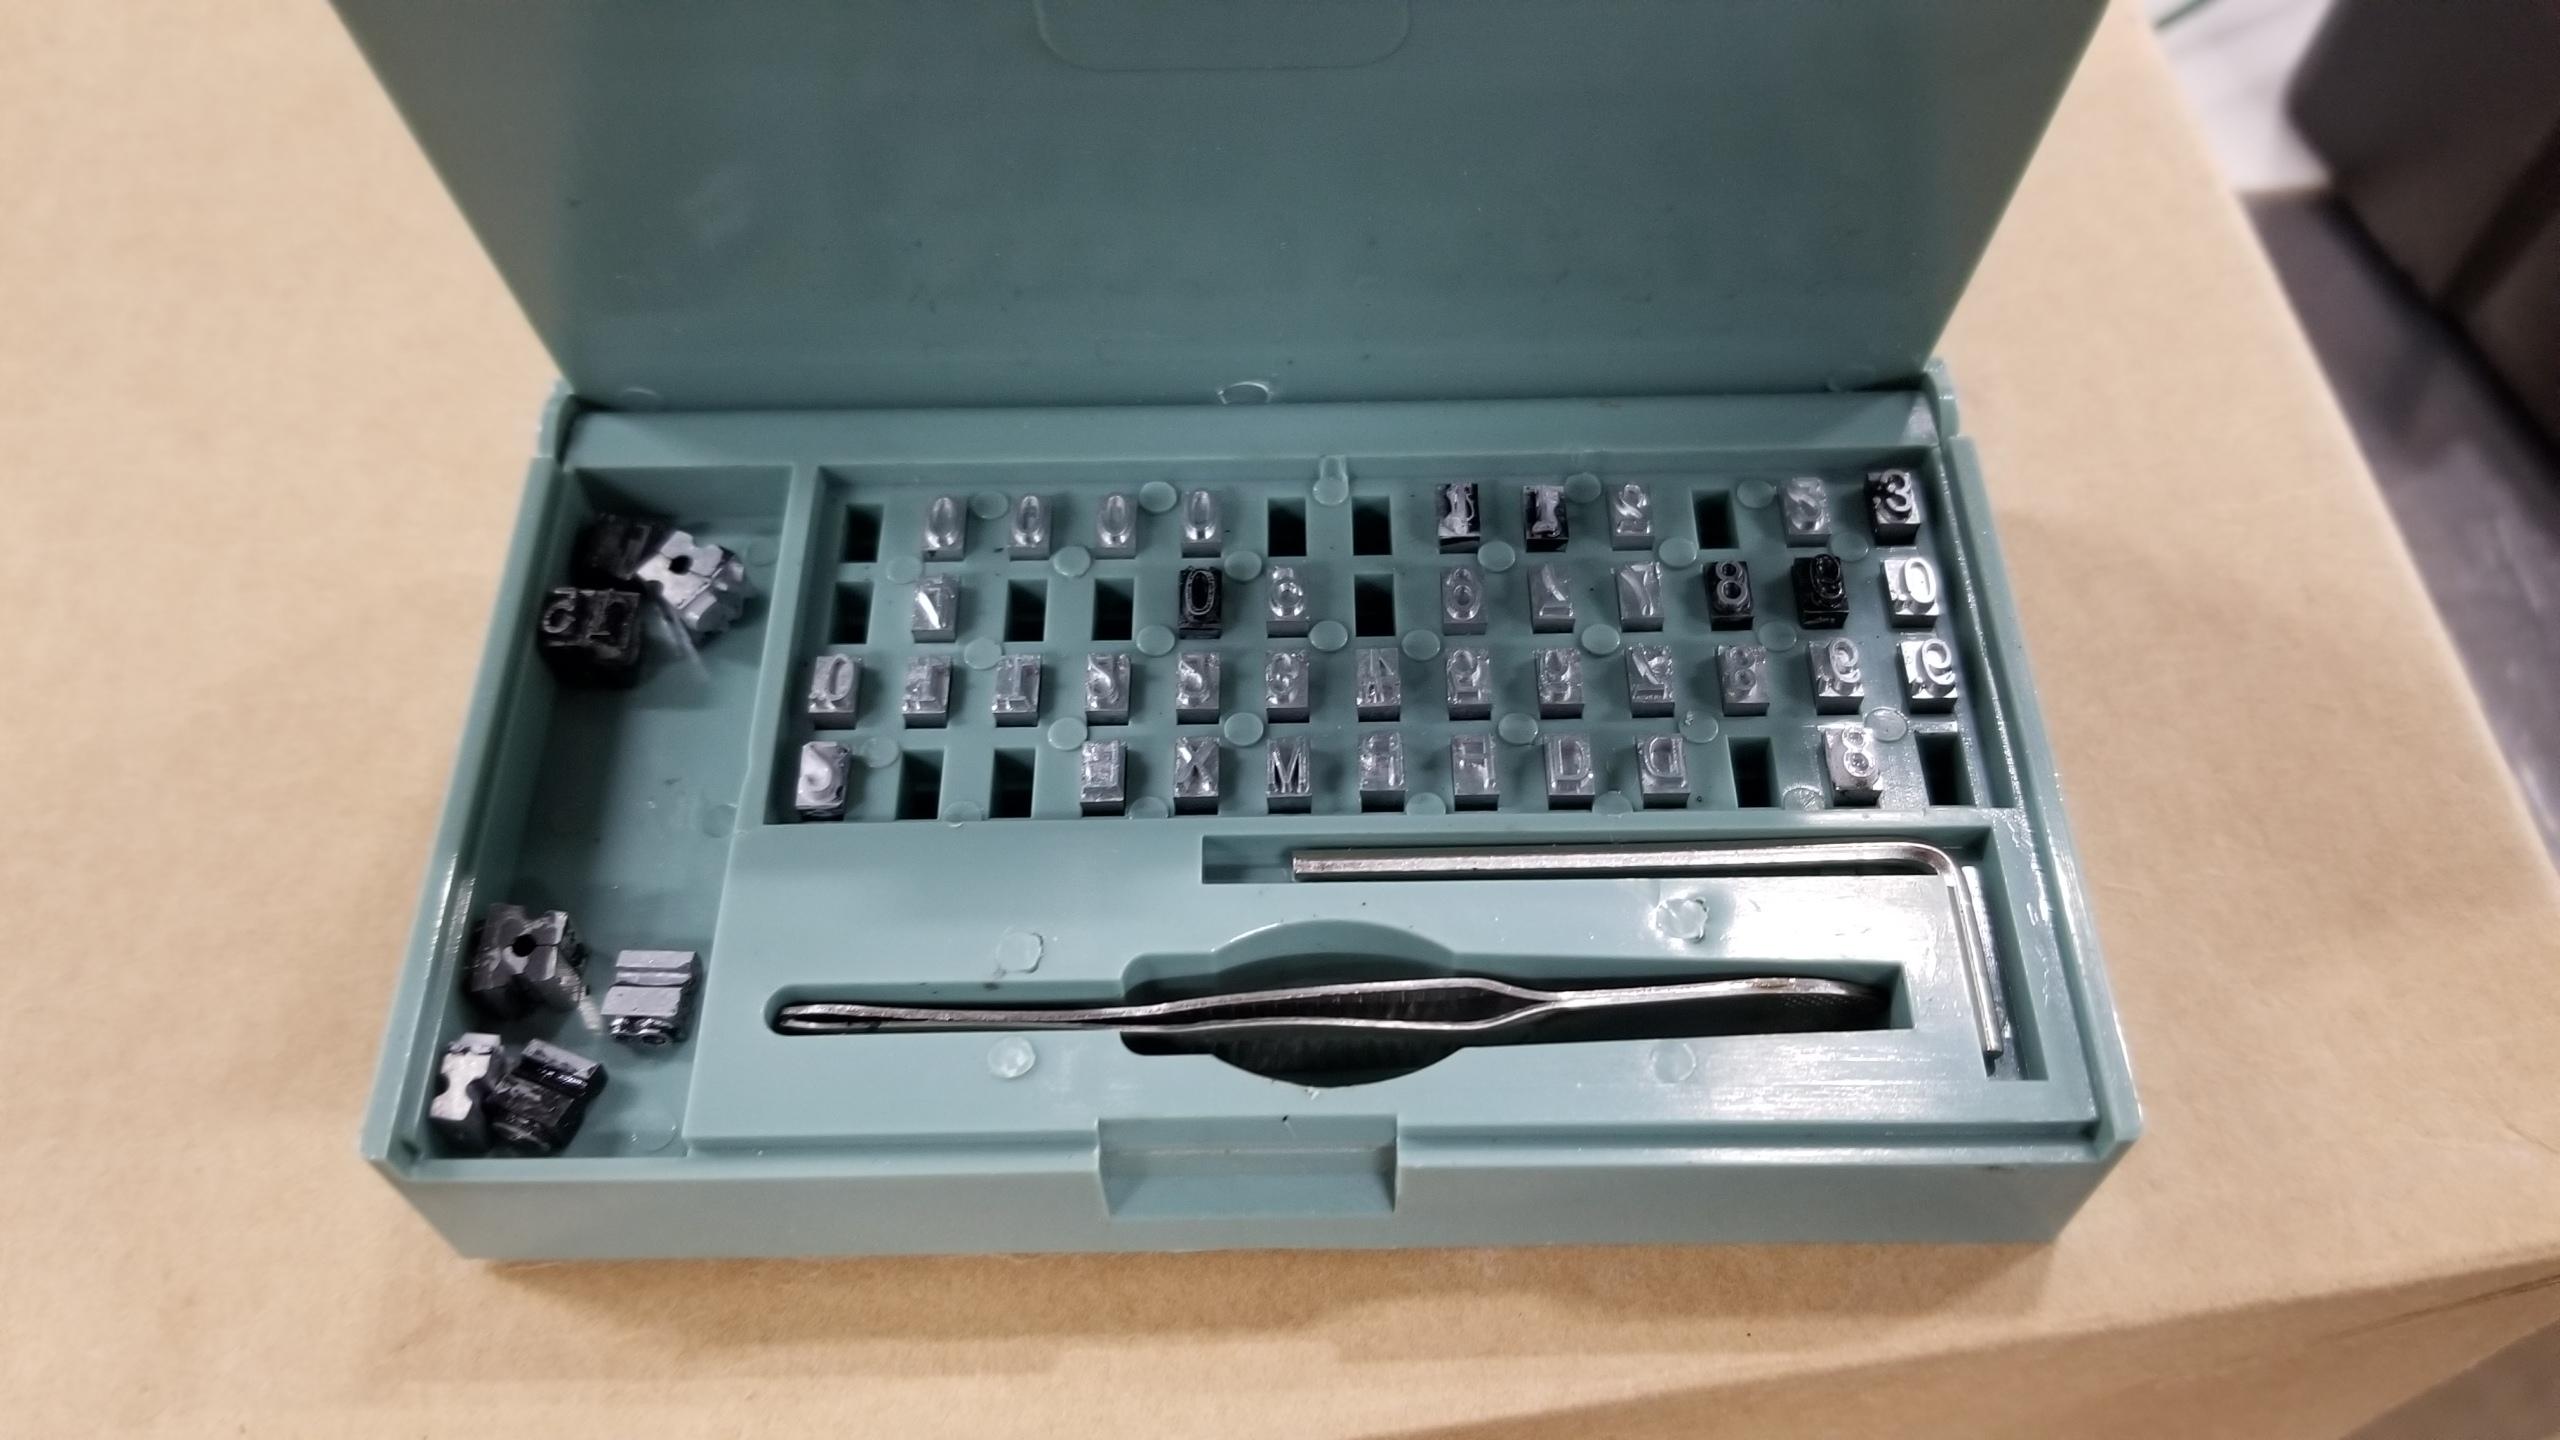 Lot 44 - Apollo model CBS-910C1 Bag Sealer with Ink Printer and Conveyor